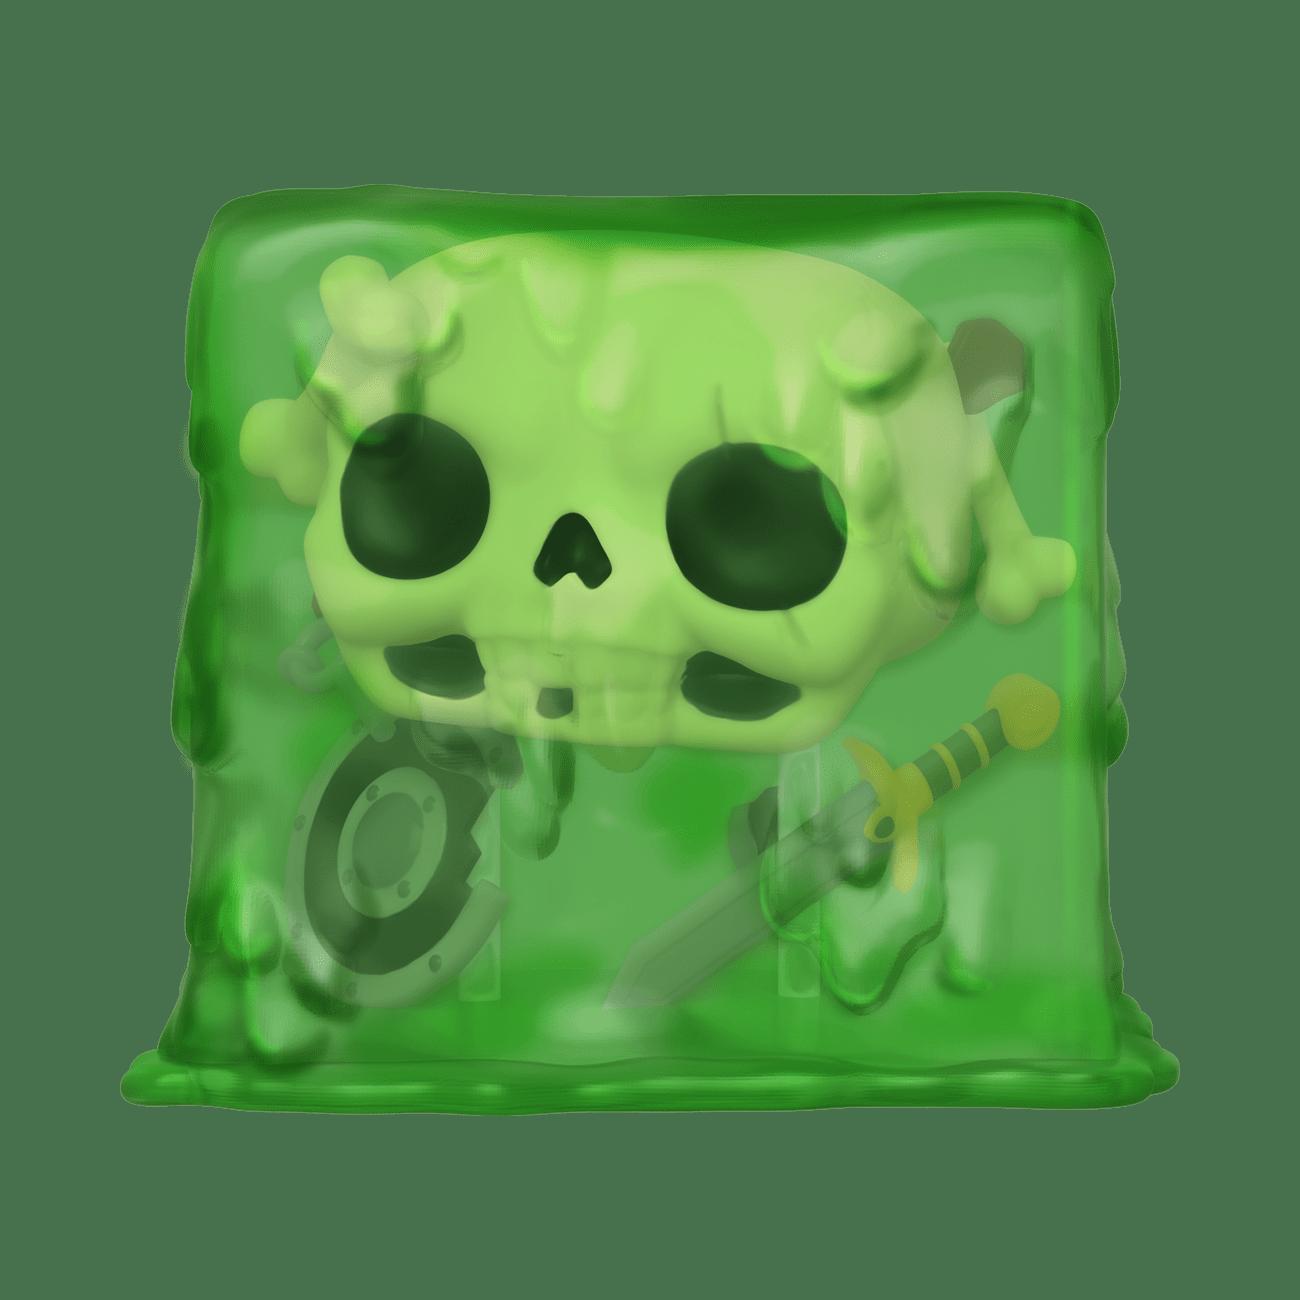 D&D Gelatinous Cube Funko Pop